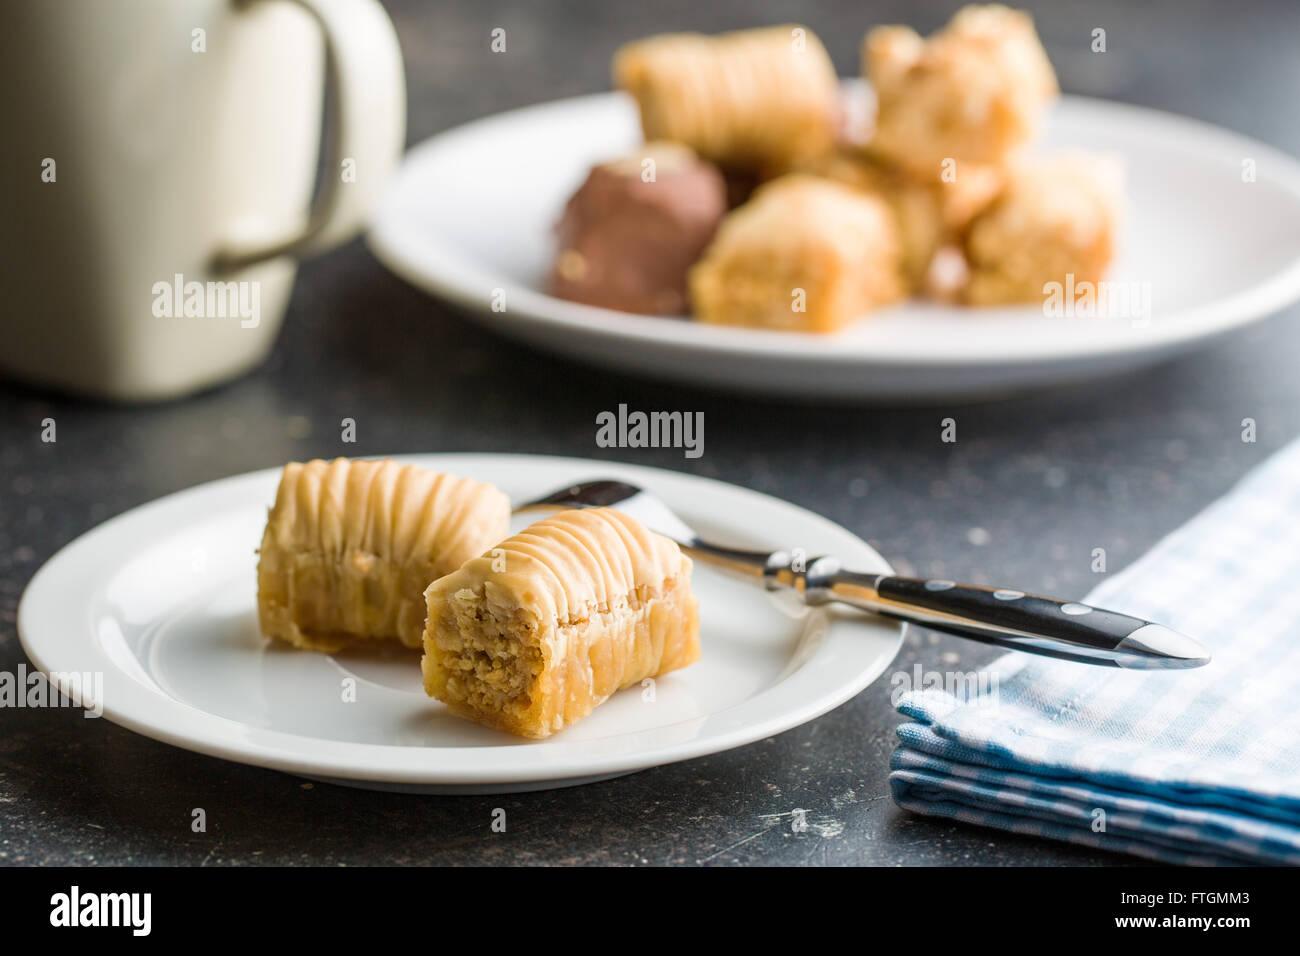 Baklava dulce postre en la placa Imagen De Stock